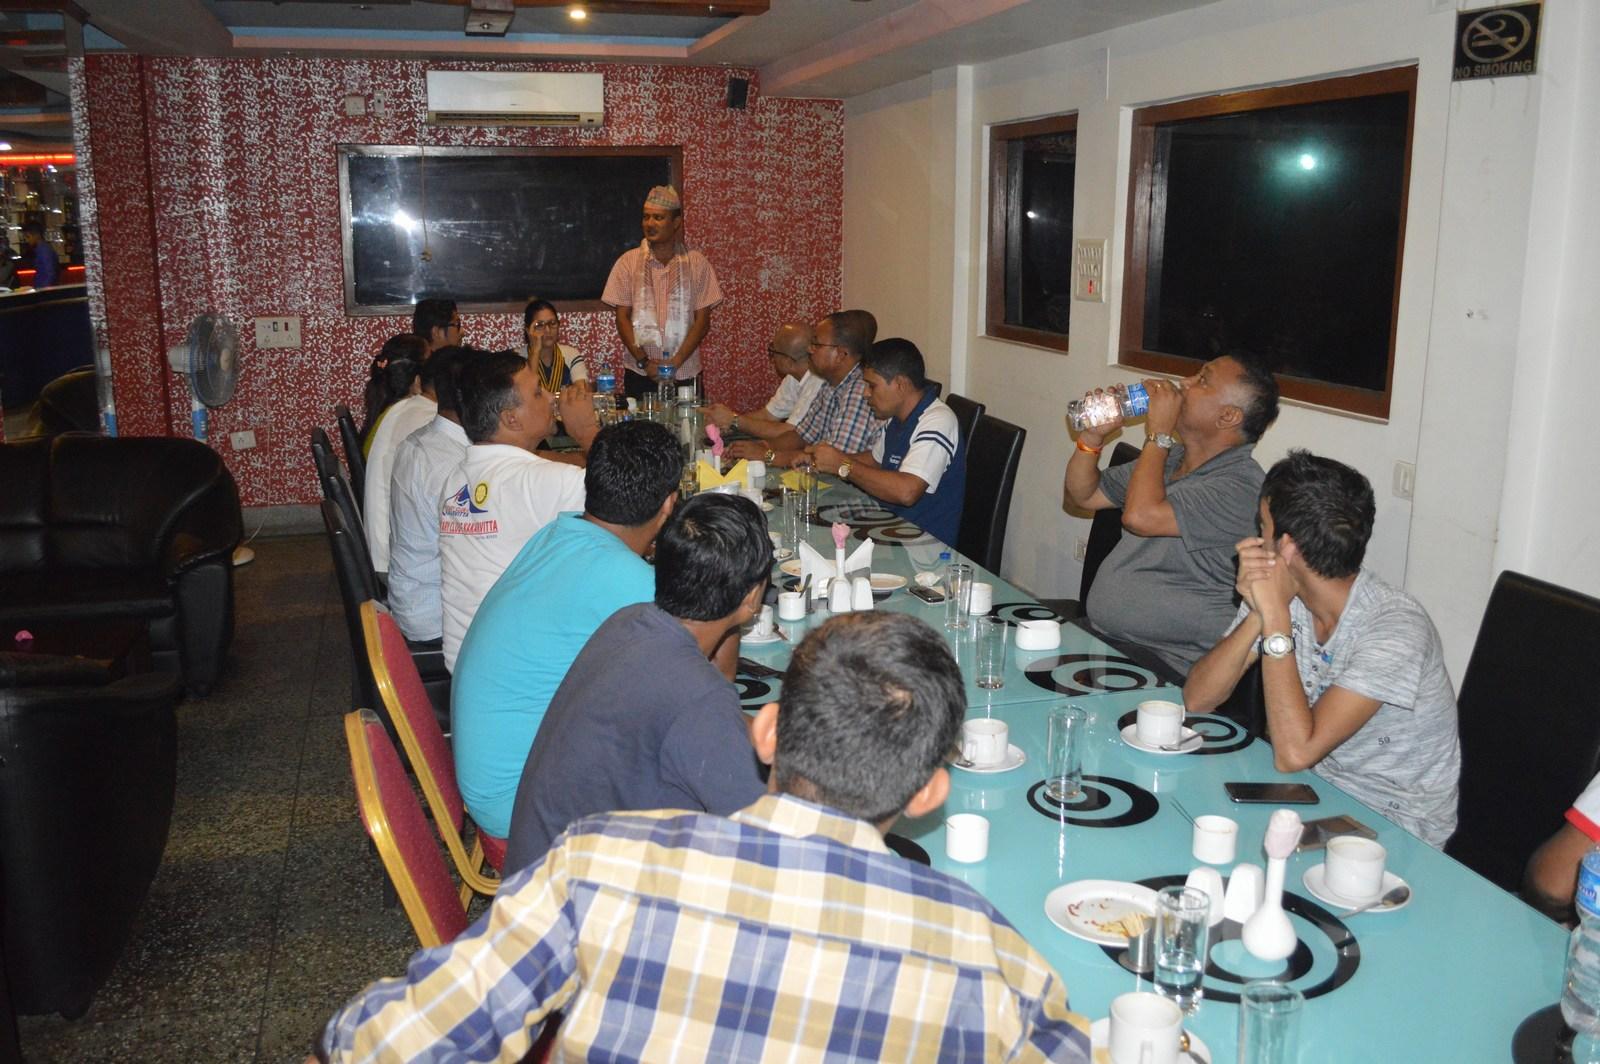 Weekly-Meeting-with-the-Guest-Speaker-DSP-Durga-Raj-Regmi-Rotary-Club-of-Kakarvitta-13